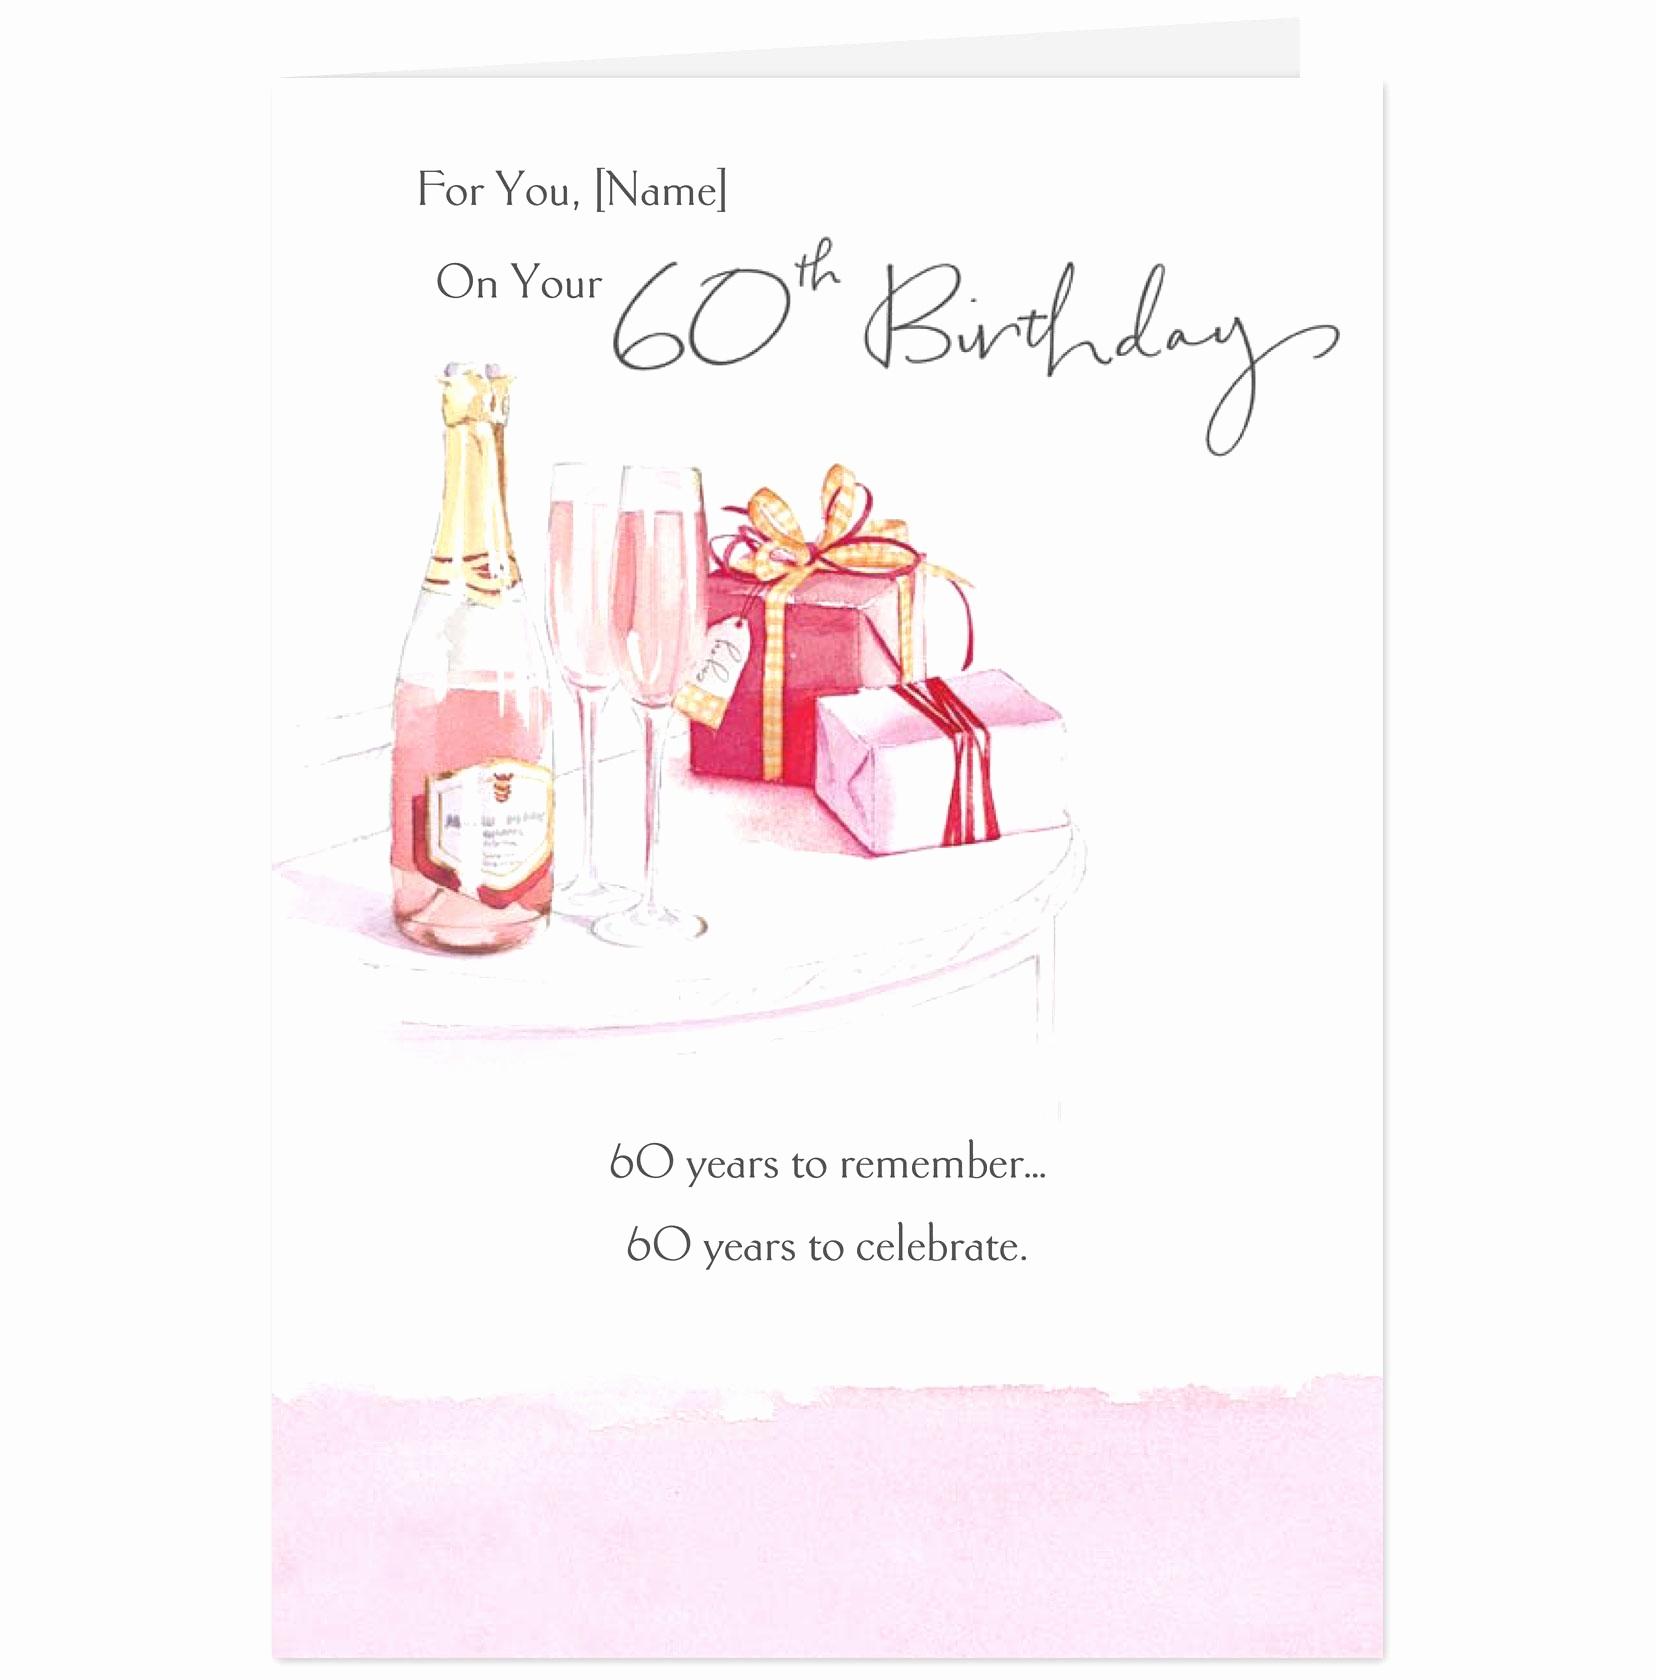 Free Printable Hallmark Birthday Cards – Rtrs.online - Free Printable Hallmark Cards